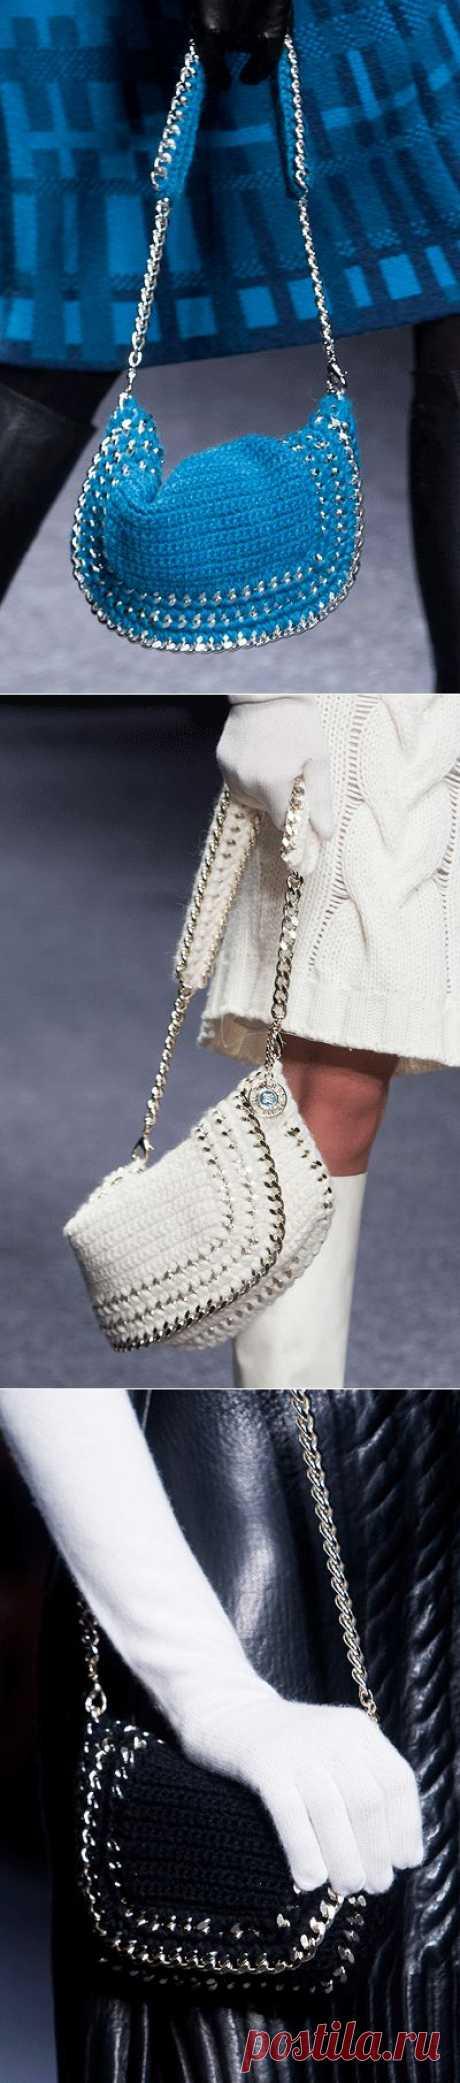 Вязаная мода с подиума